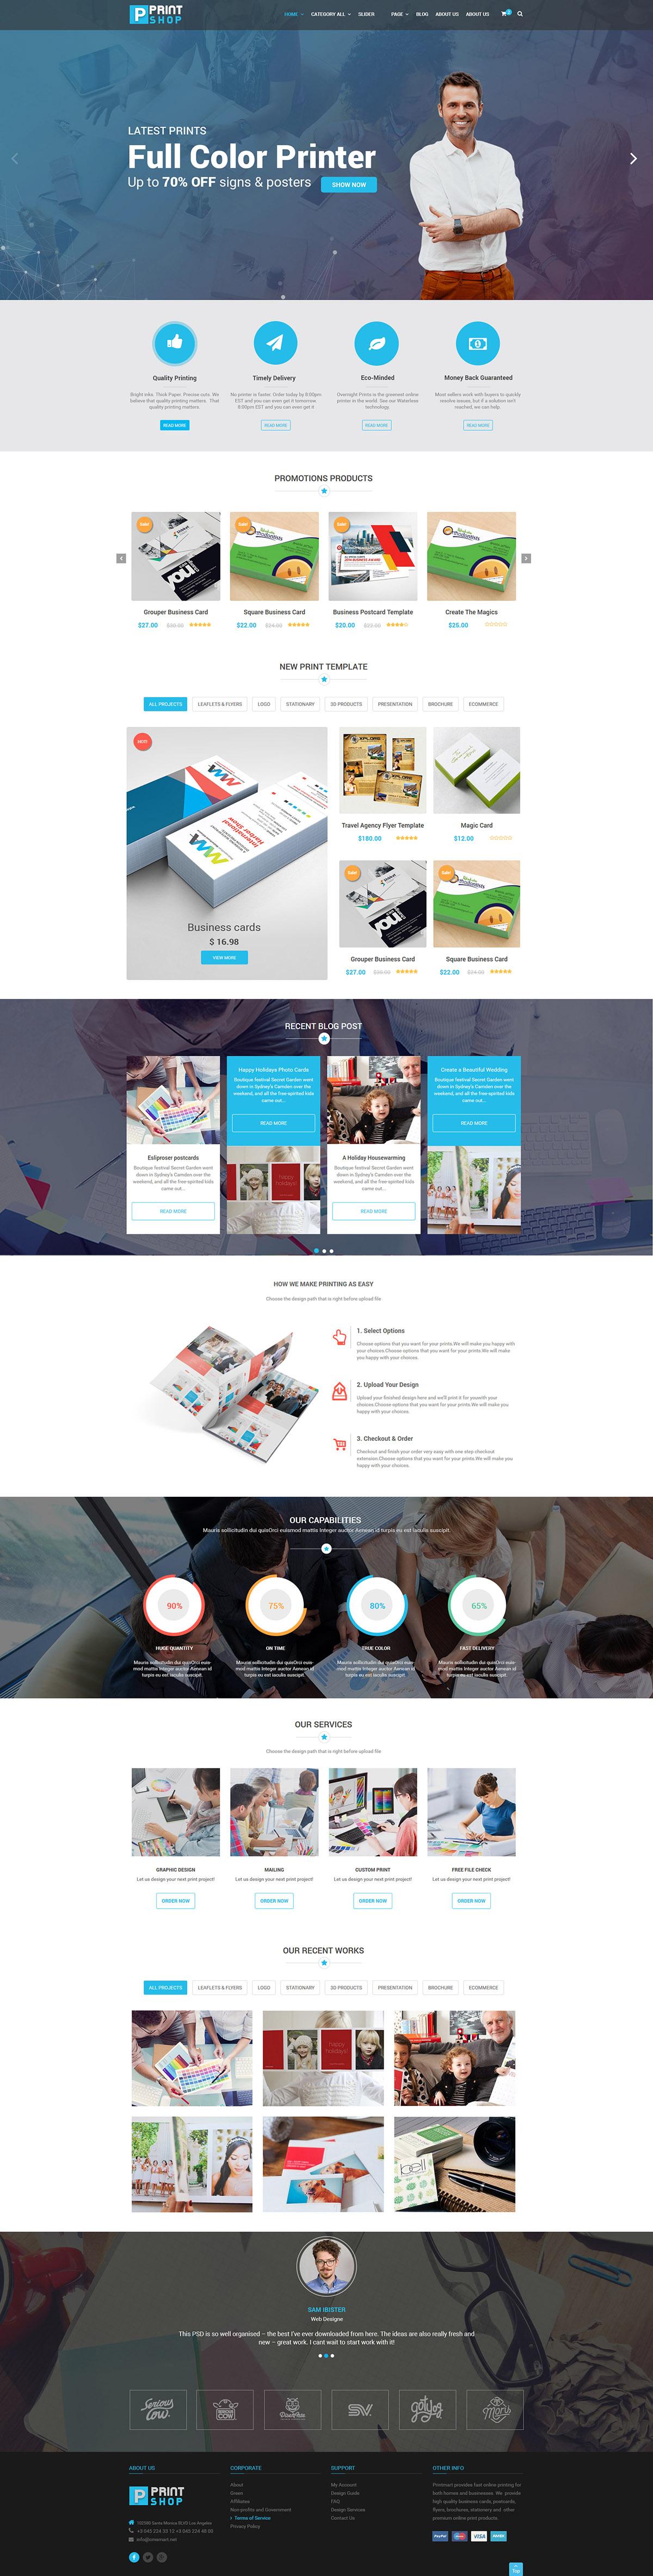 Printshop wordpress responsive printing theme by netbaseteam screenshot01bannerg fandeluxe Gallery